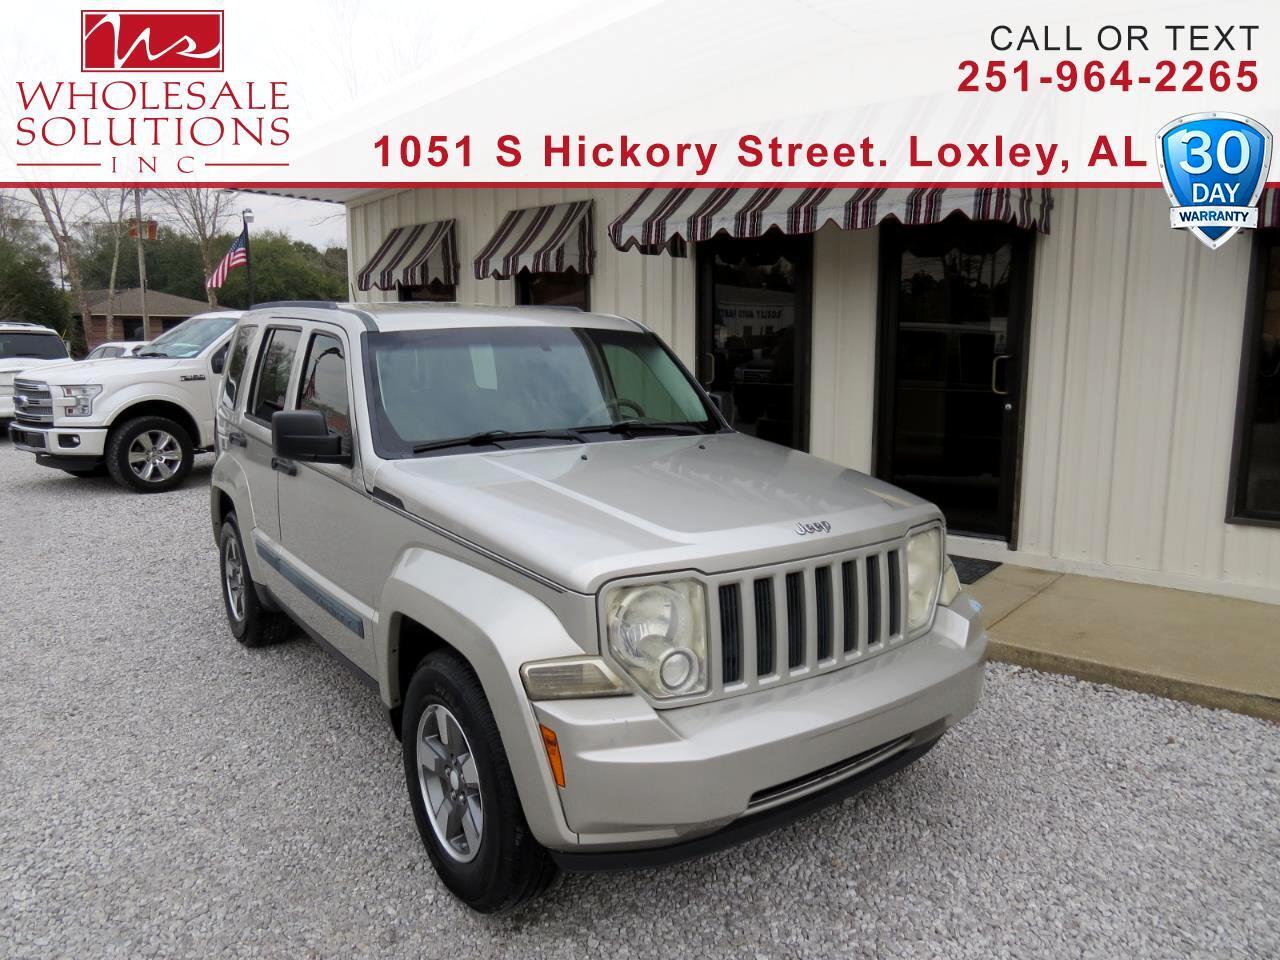 2008 Jeep Liberty 2WD 4dr Sport